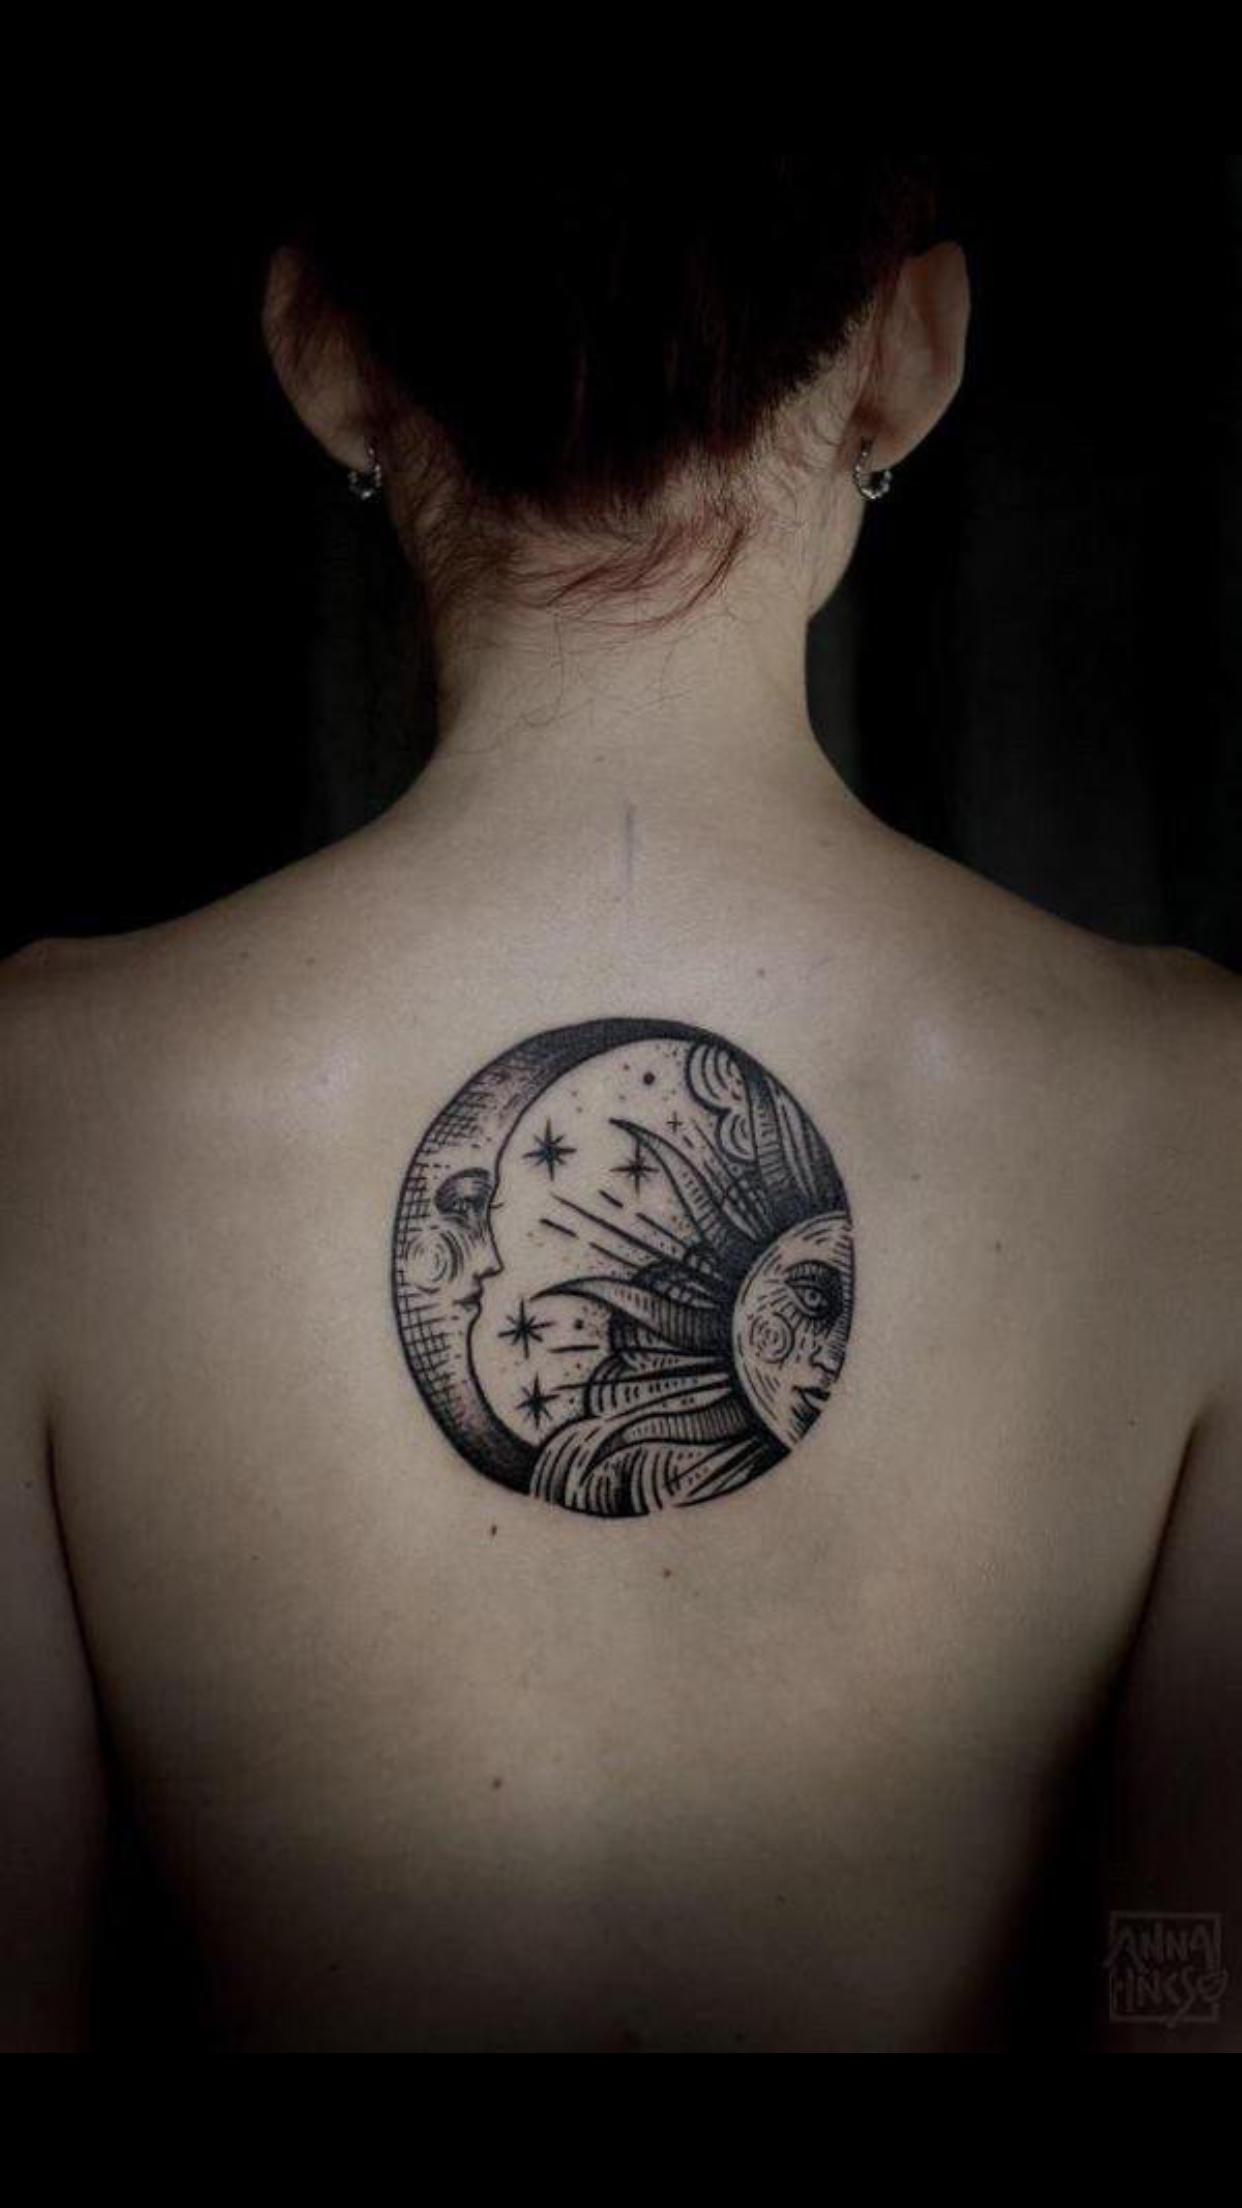 Pin by Brittany Kovach on Tattoo ideas   Moon tattoo